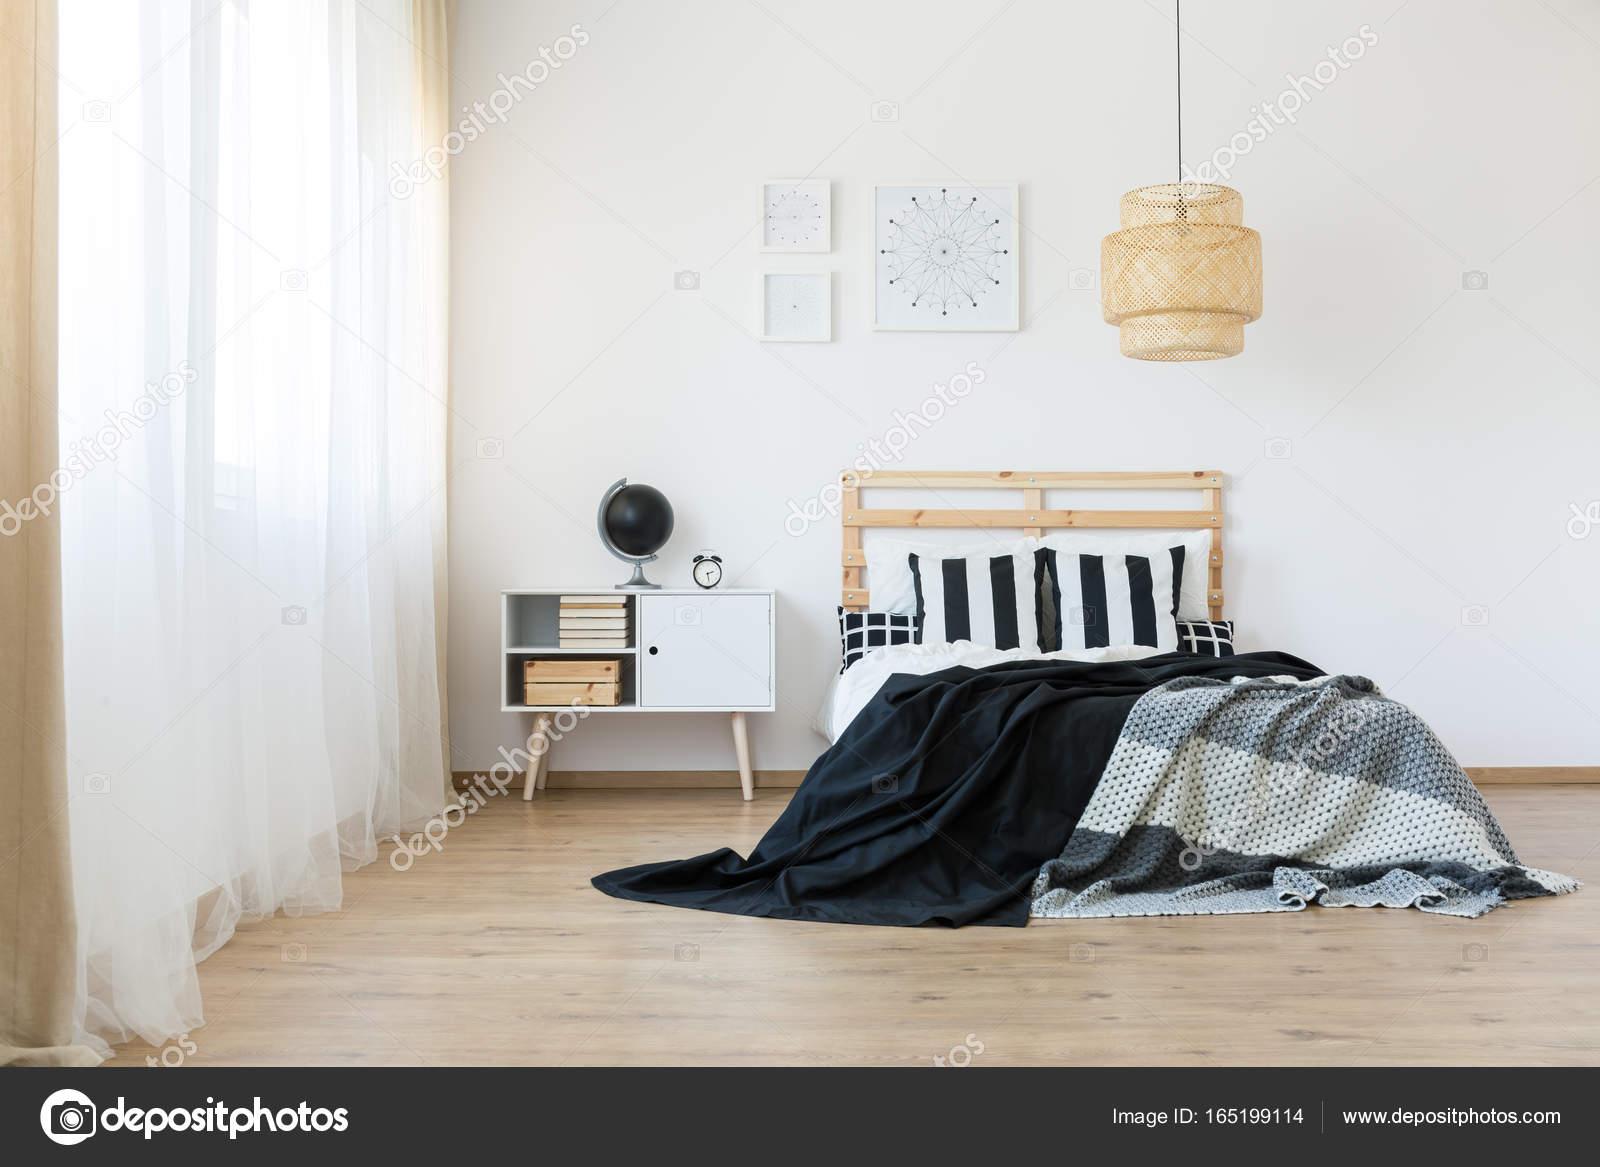 https://st3.depositphotos.com/2249091/16519/i/1600/depositphotos_165199114-stockafbeelding-ruime-en-lichte-slaapkamer.jpg